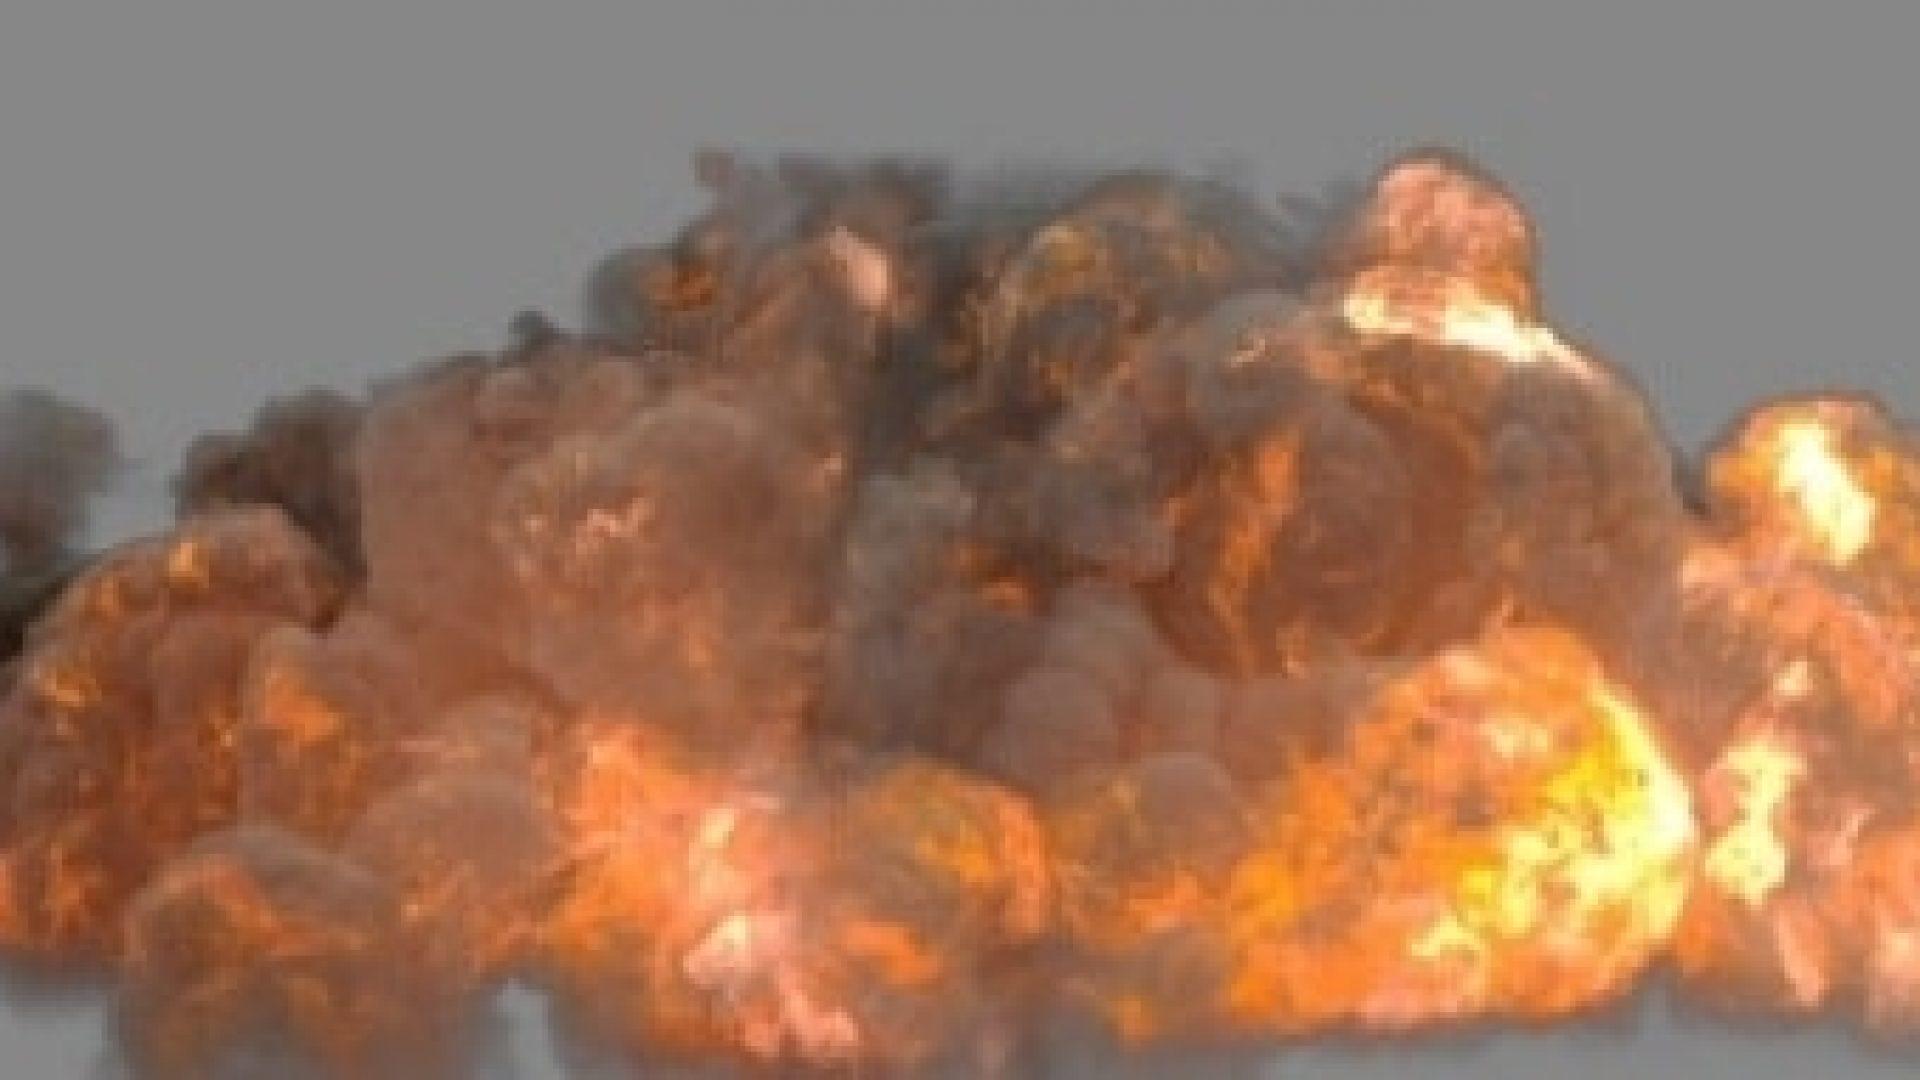 FumeFx Heavy Detonation - 3D fx preset creator, VFX Online Store, 3D Animation and VFX service, Digital Alchemy